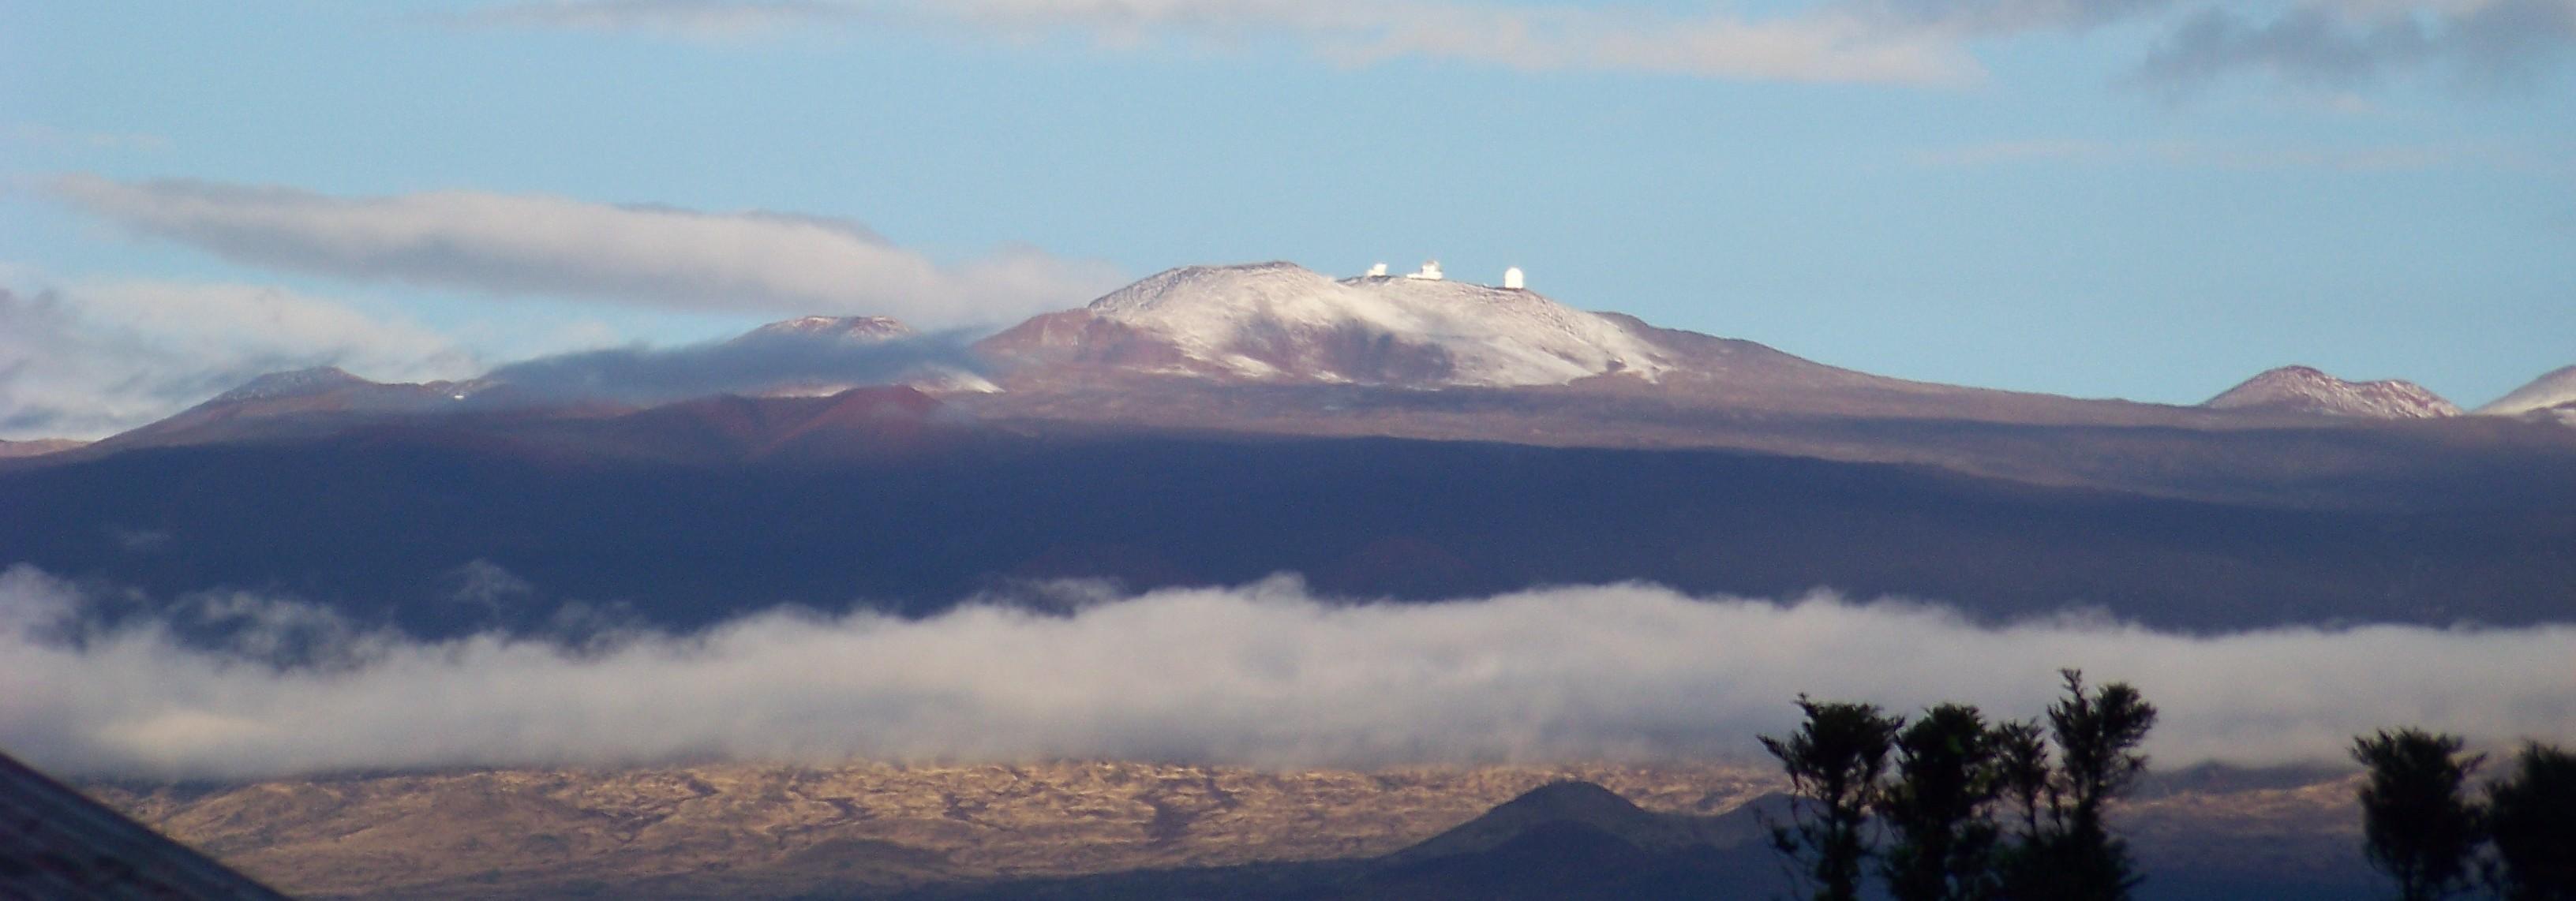 Purple Mountain Majesty The Retiring Sort